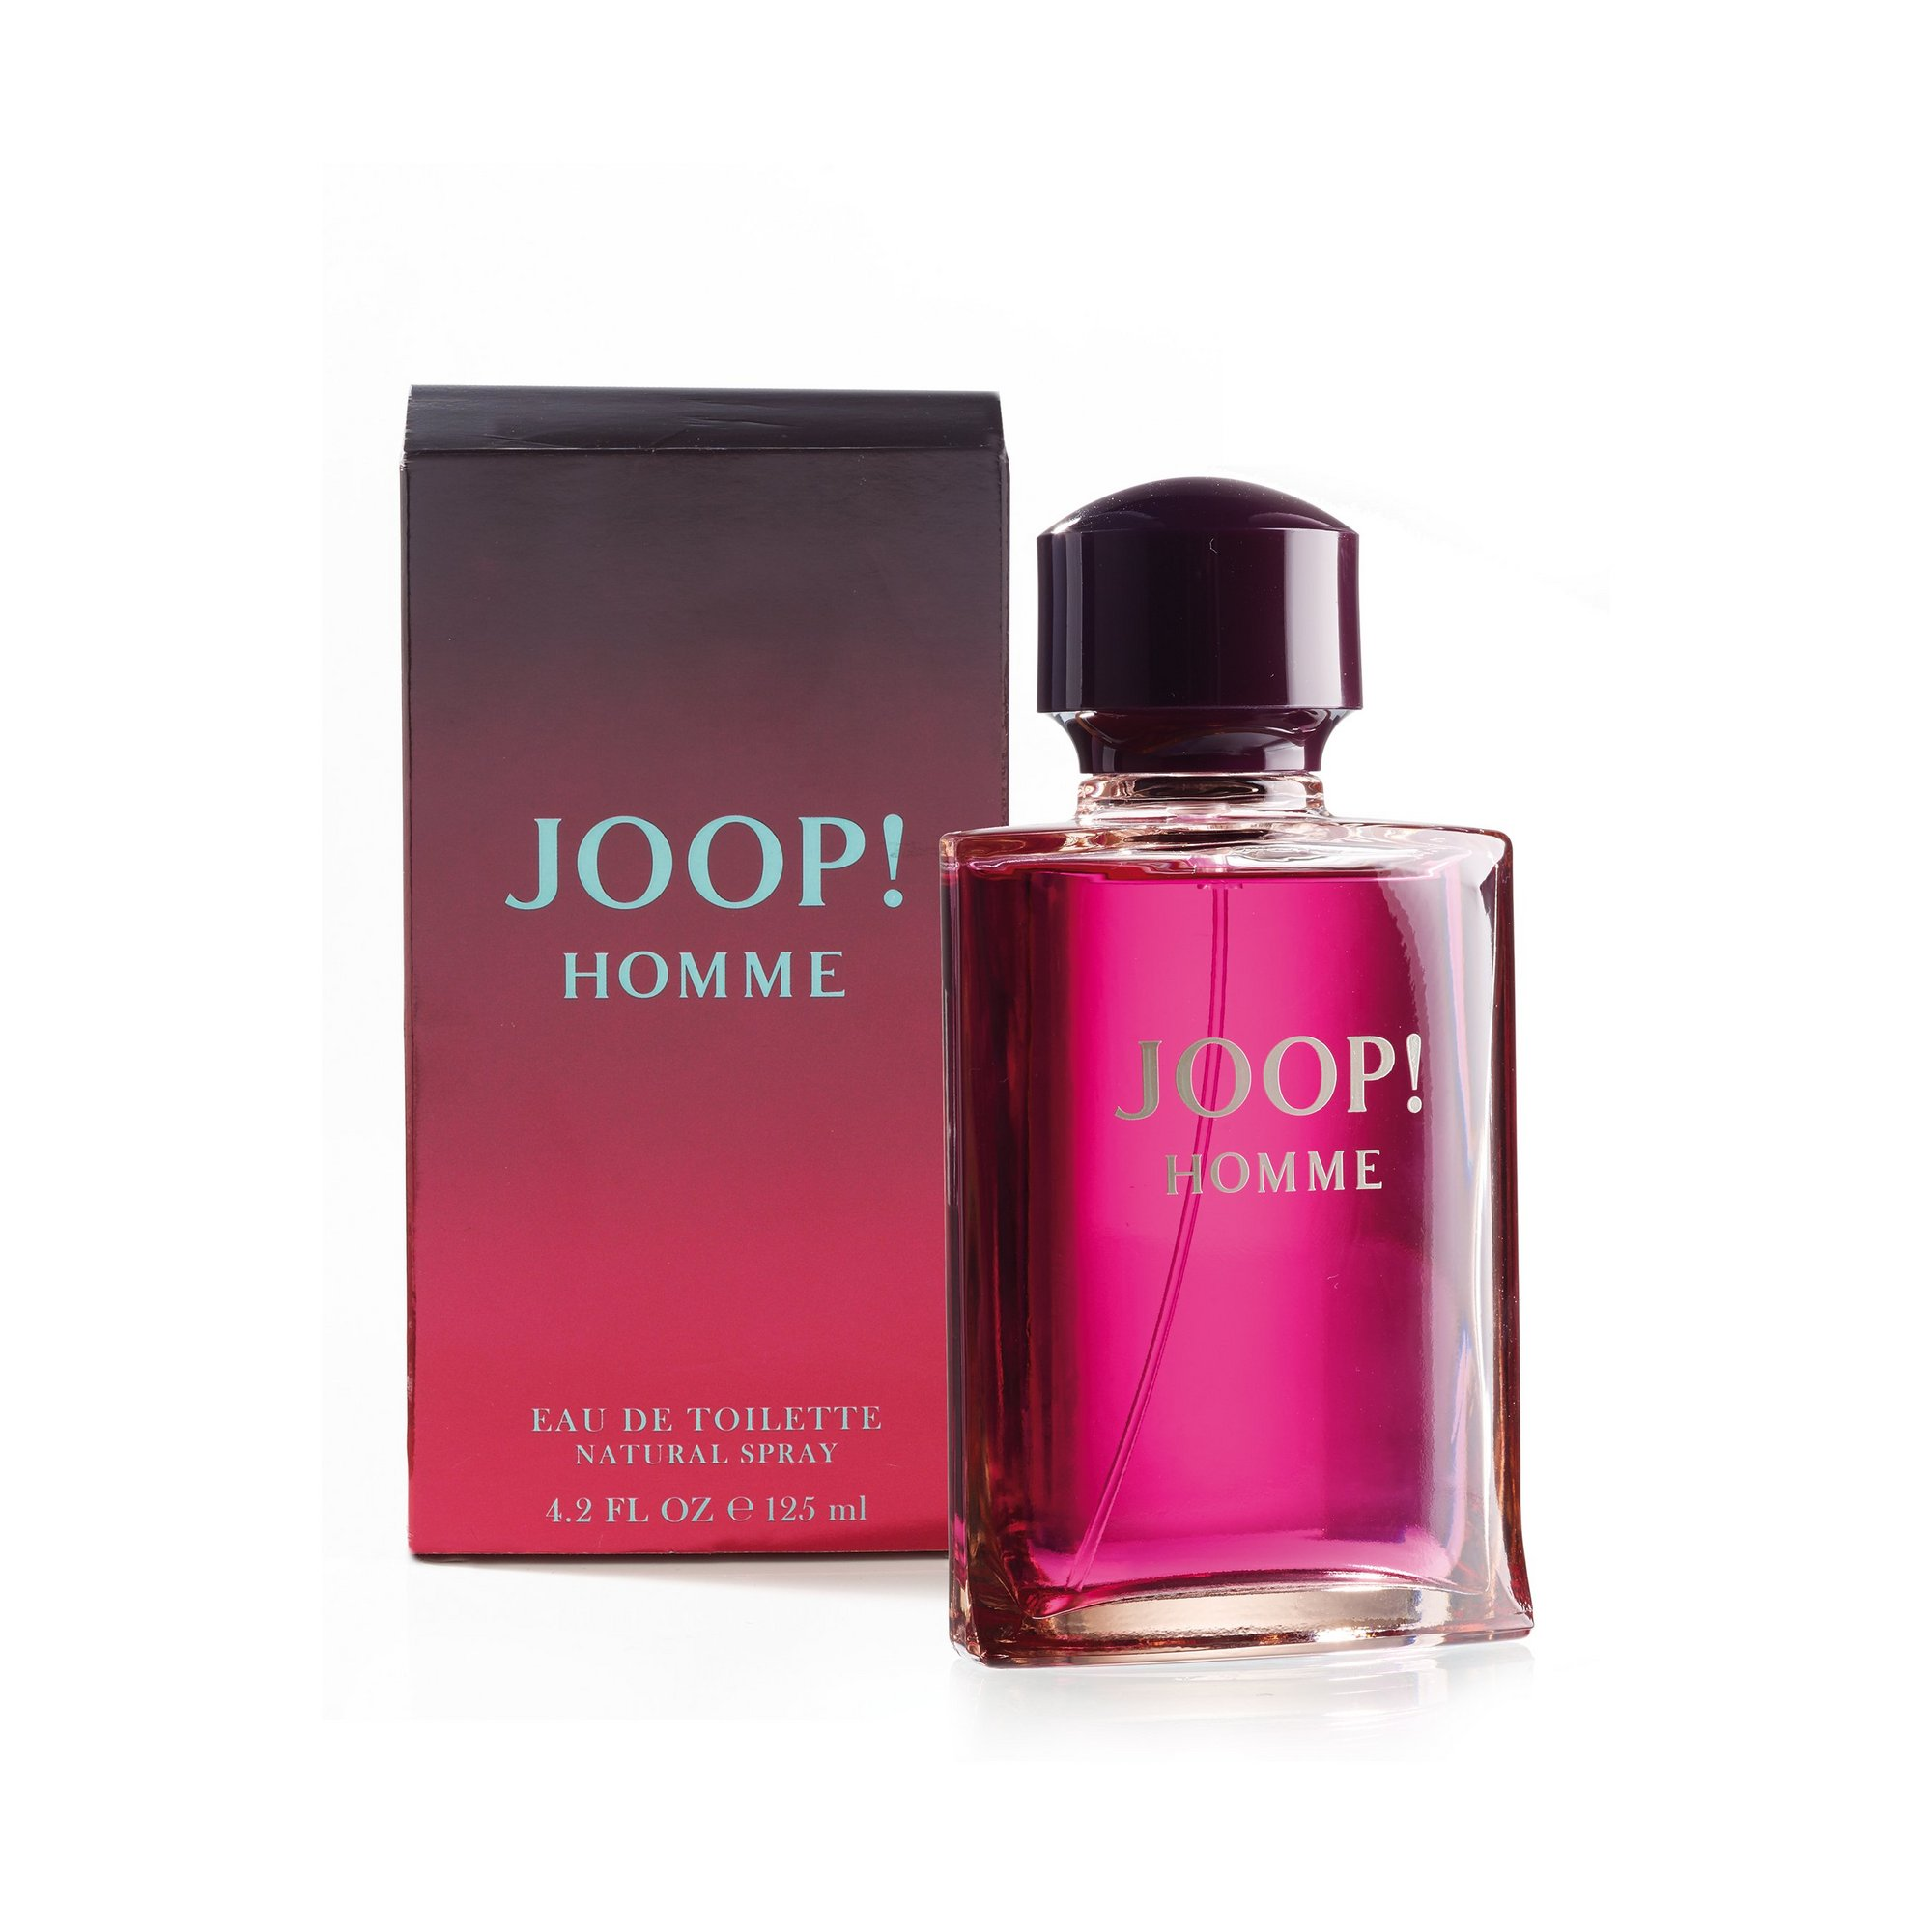 Image of Joop! Homme EDT Spray